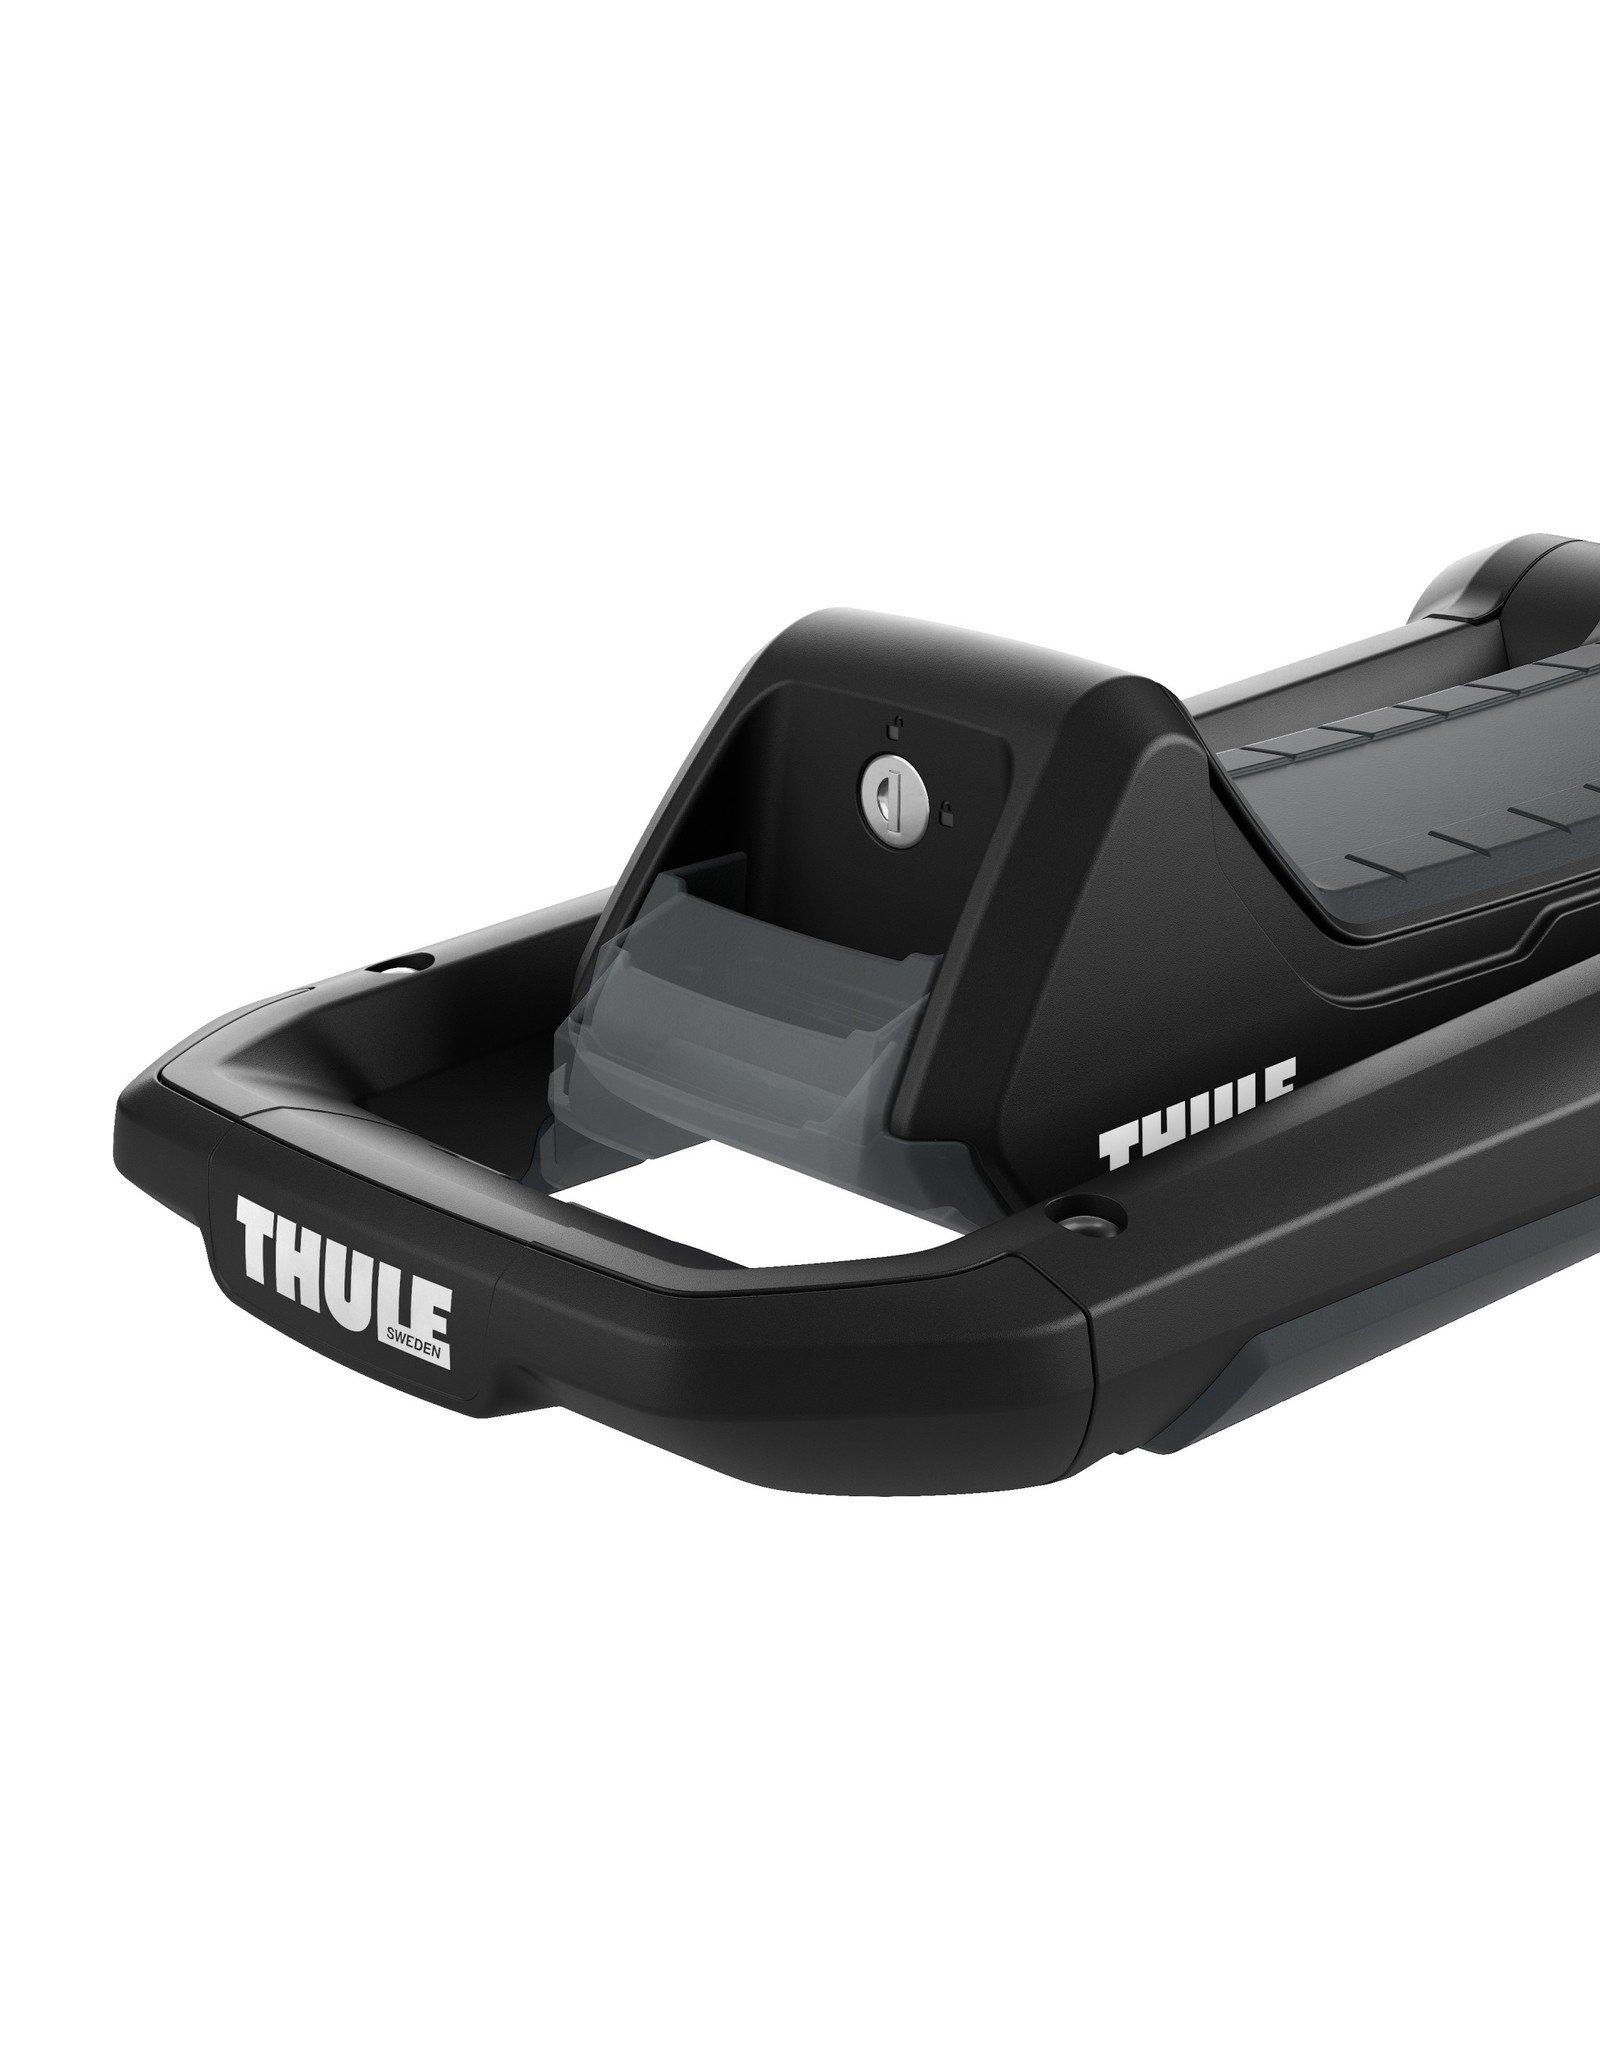 THULE Hull-A-Port Aero Black